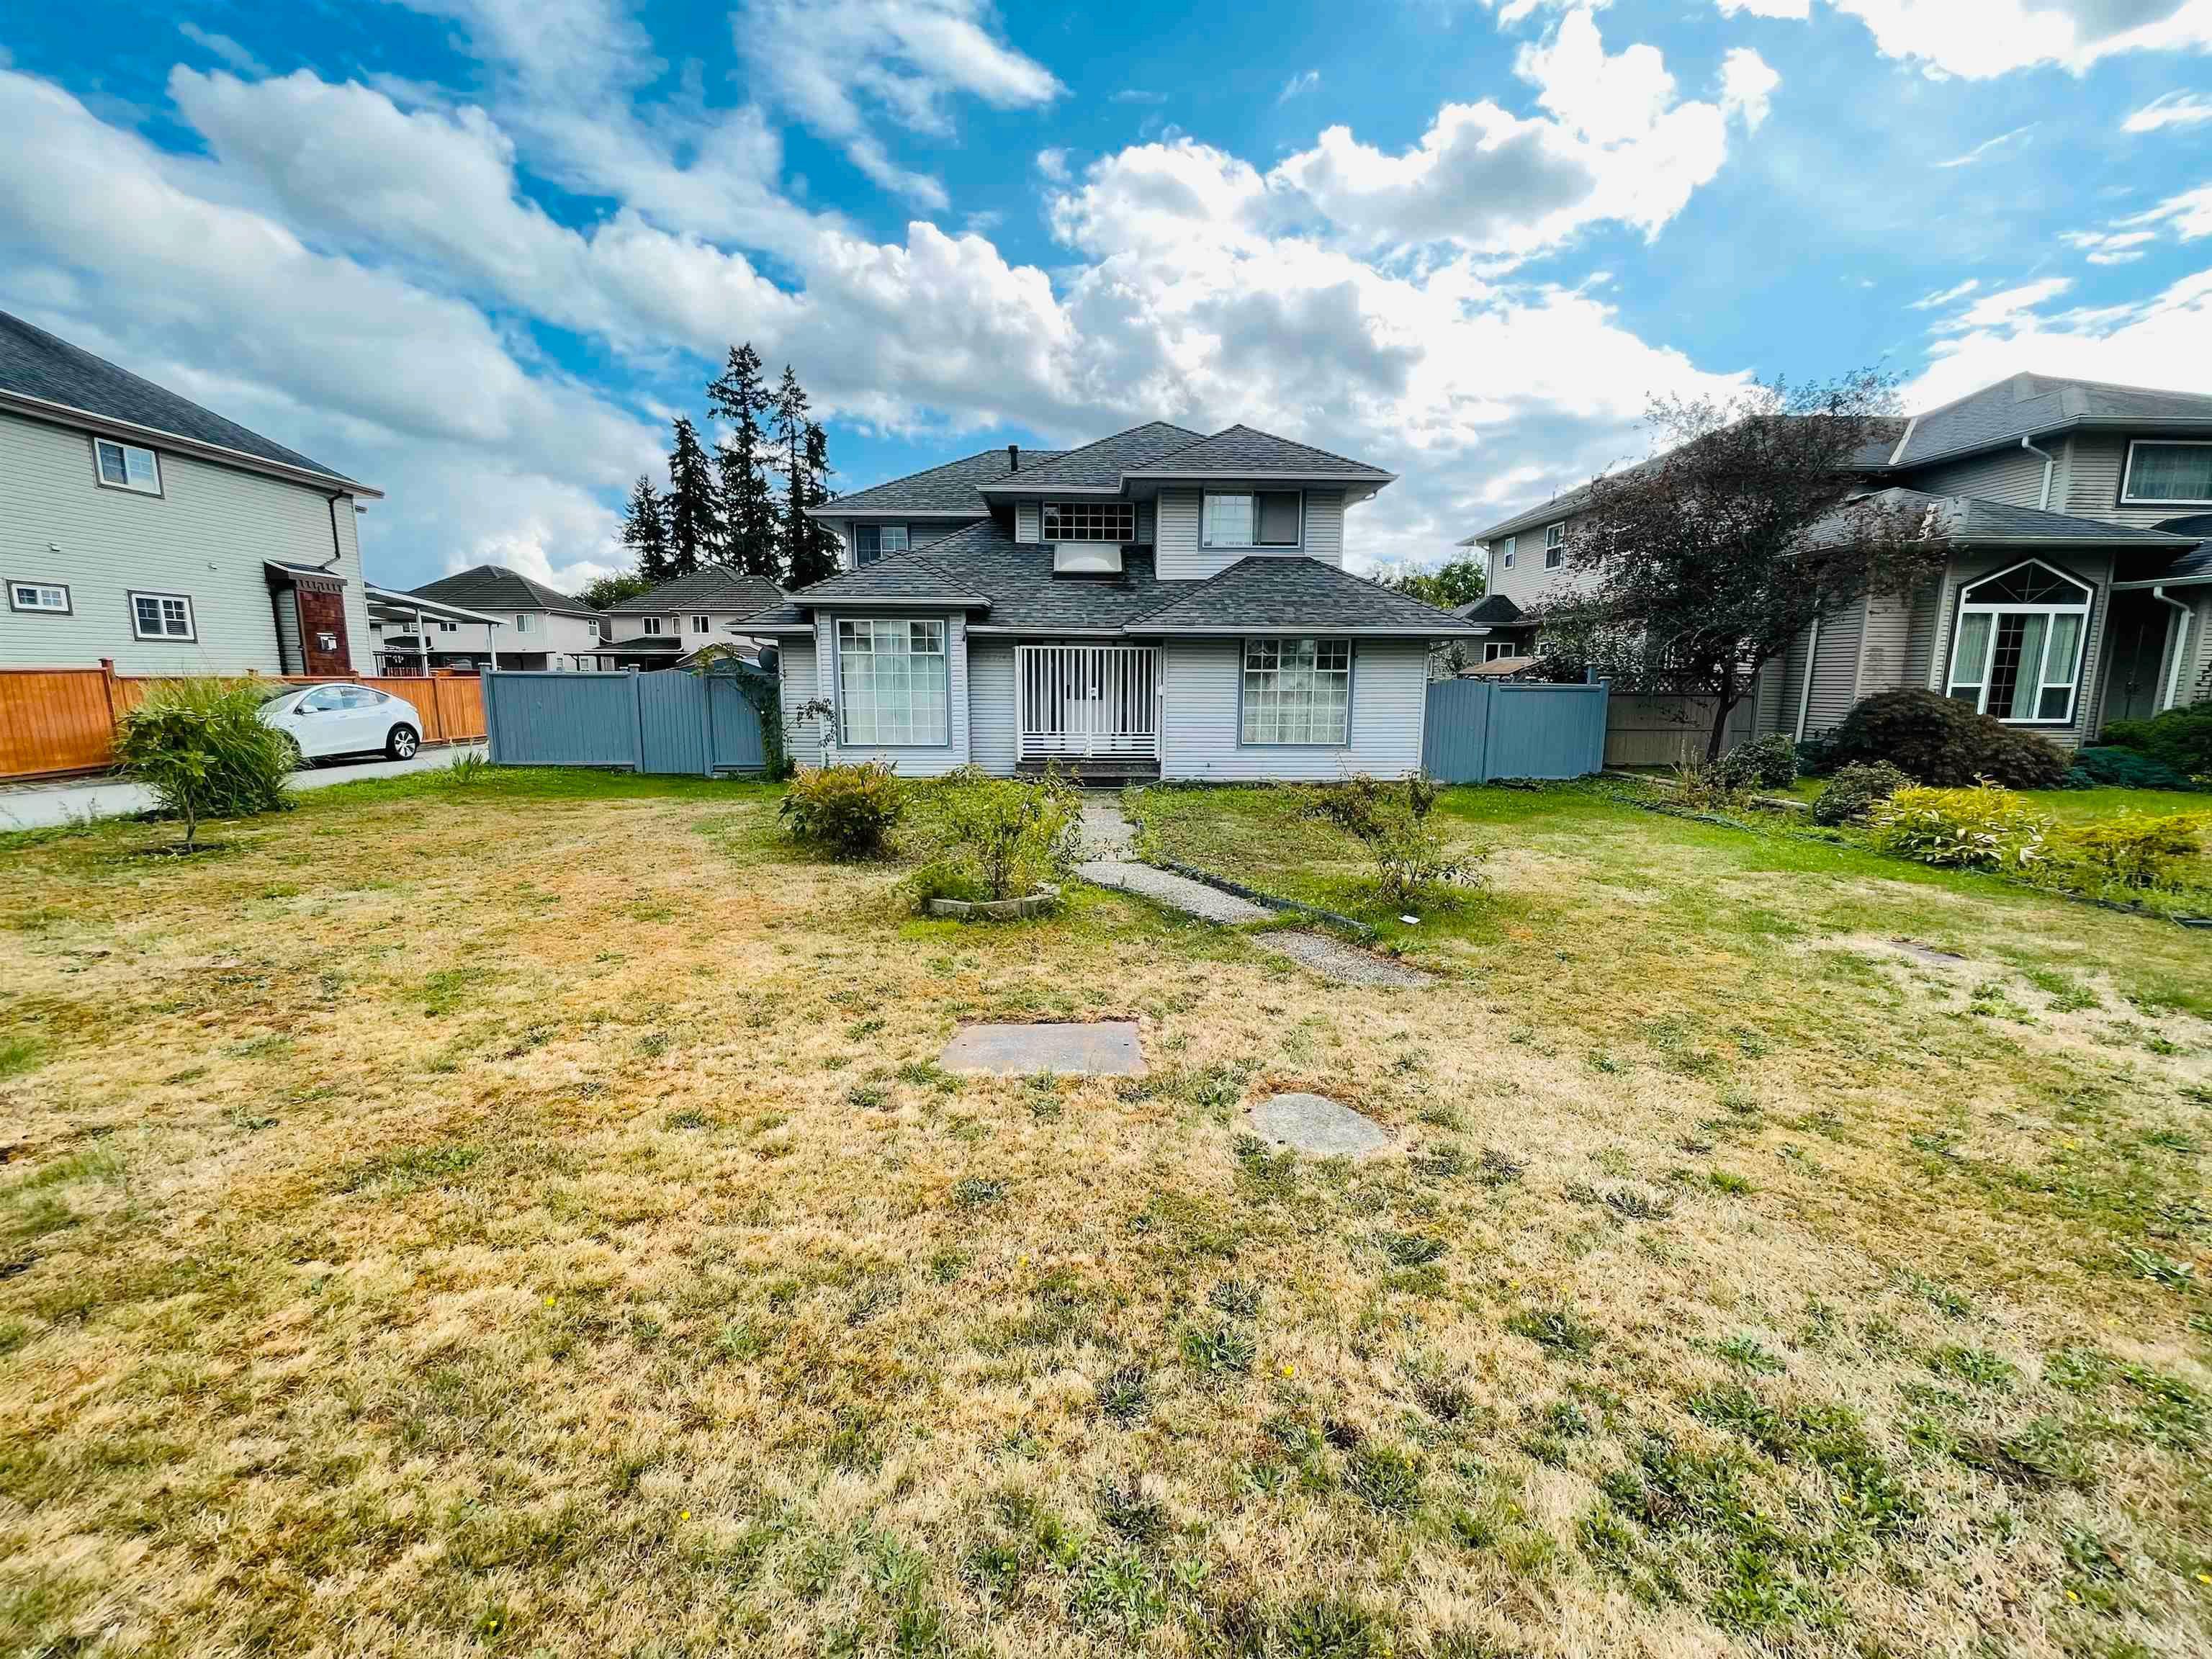 Main Photo: 15714 84 Avenue in Surrey: Fleetwood Tynehead House for sale : MLS®# R2613241